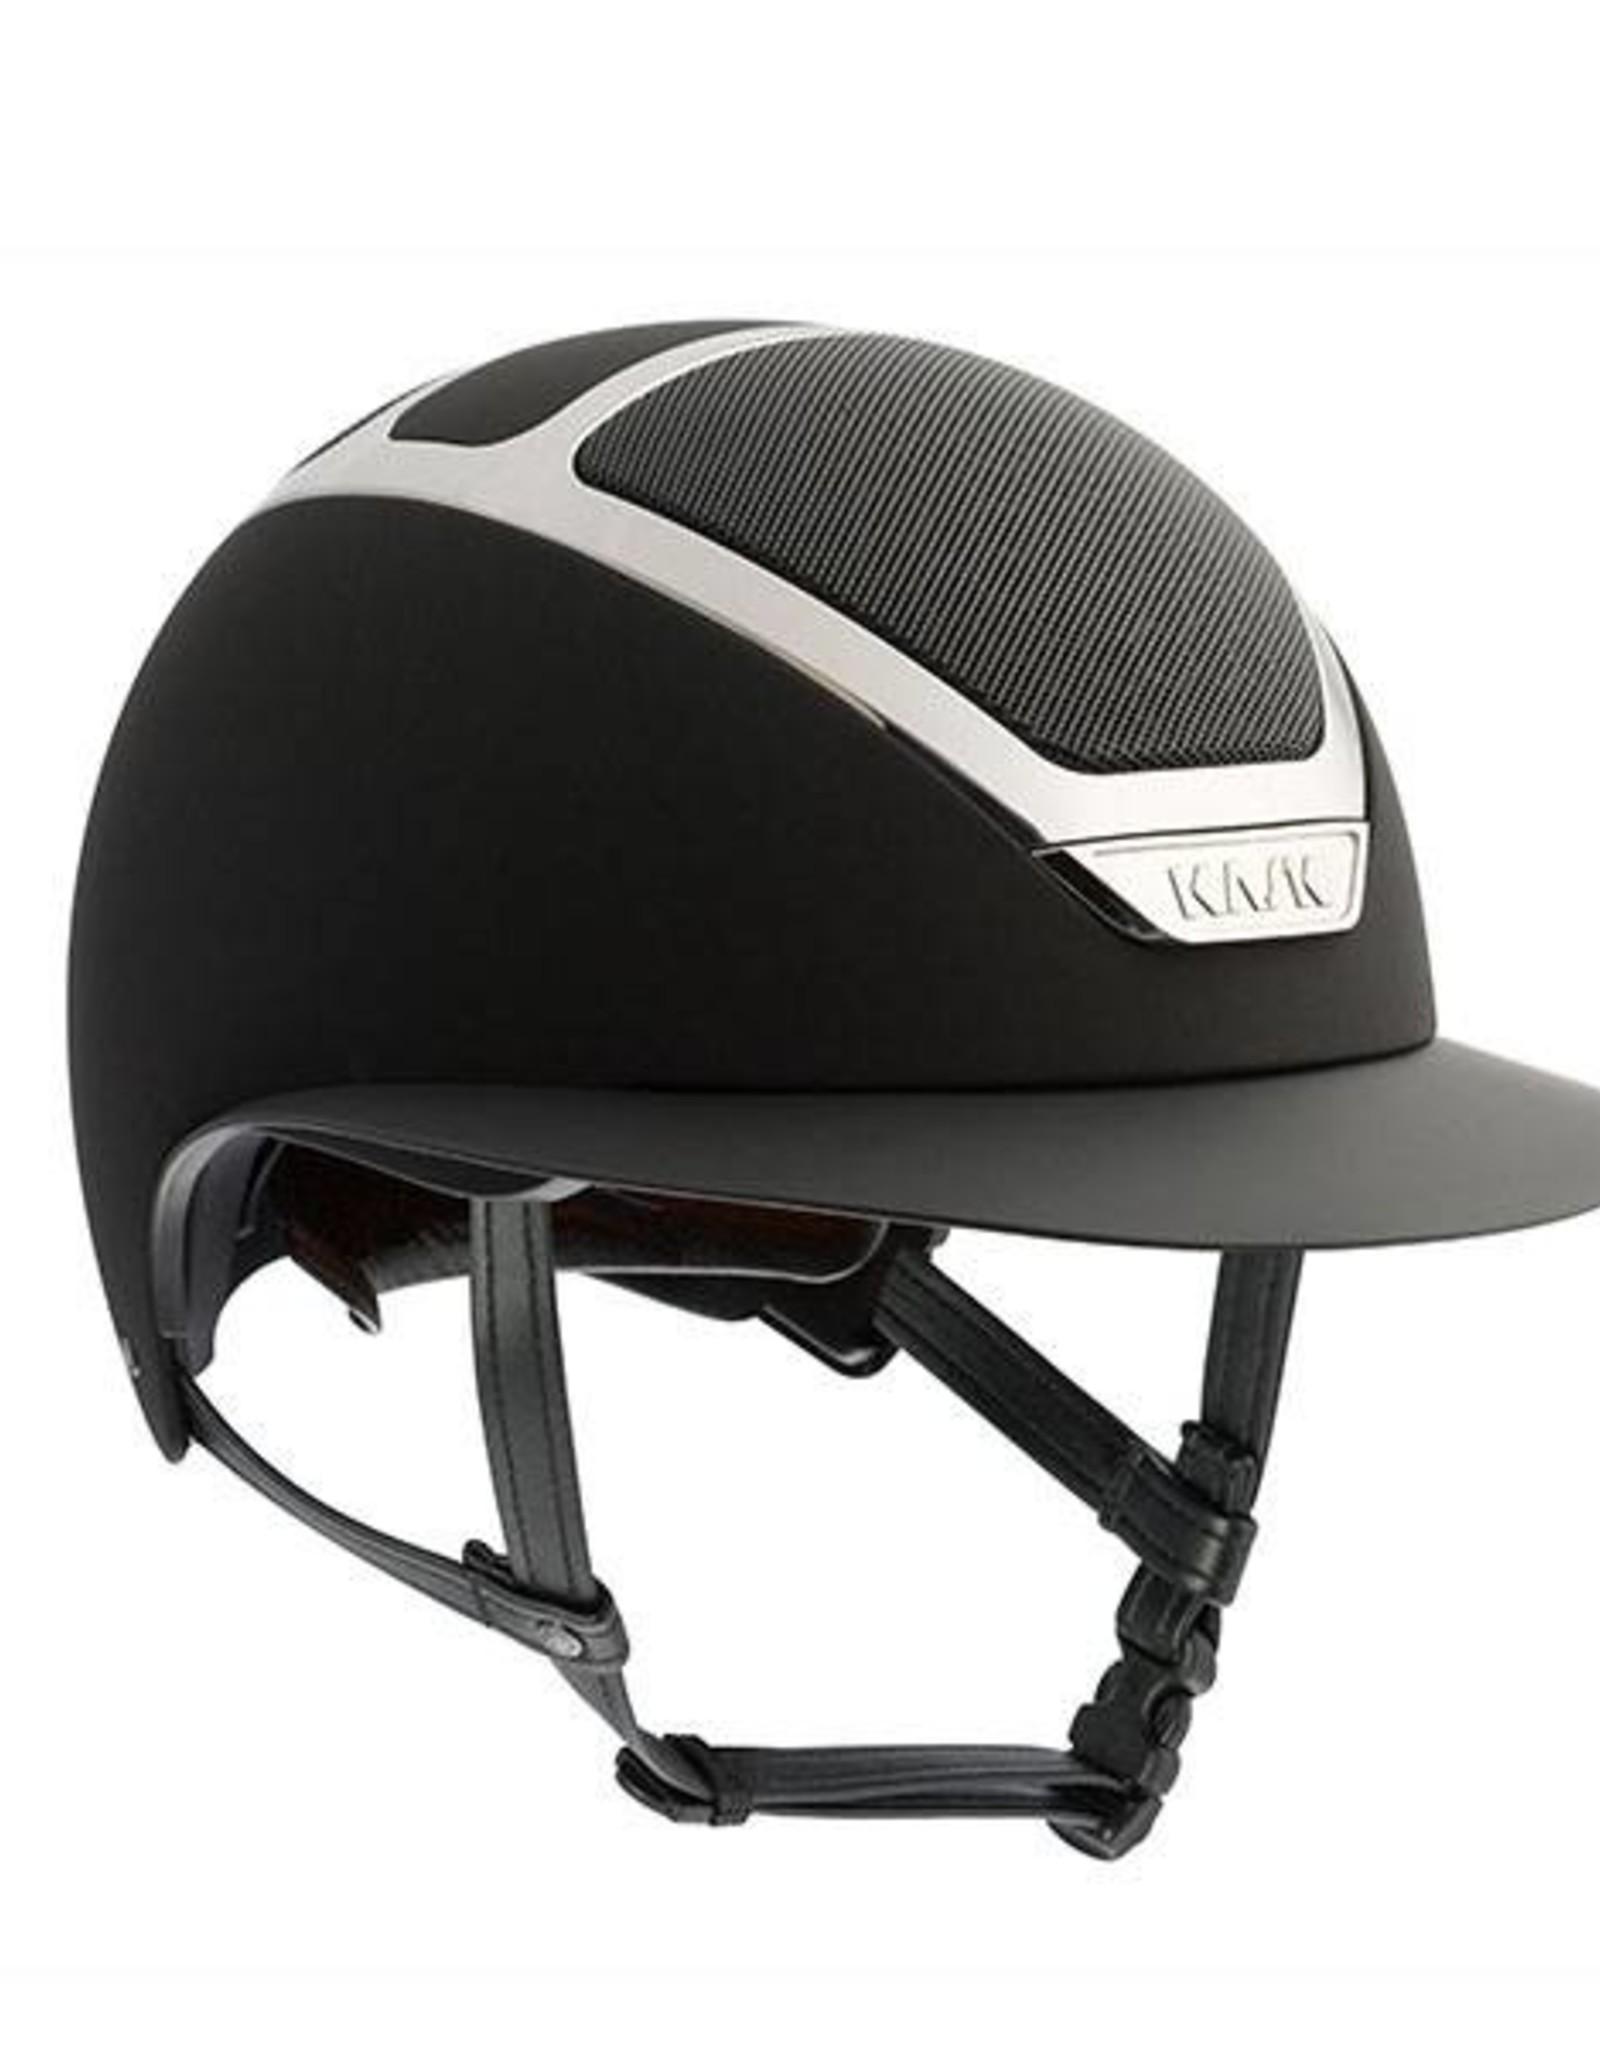 KASK Kask Dogma Star Lady Helmet